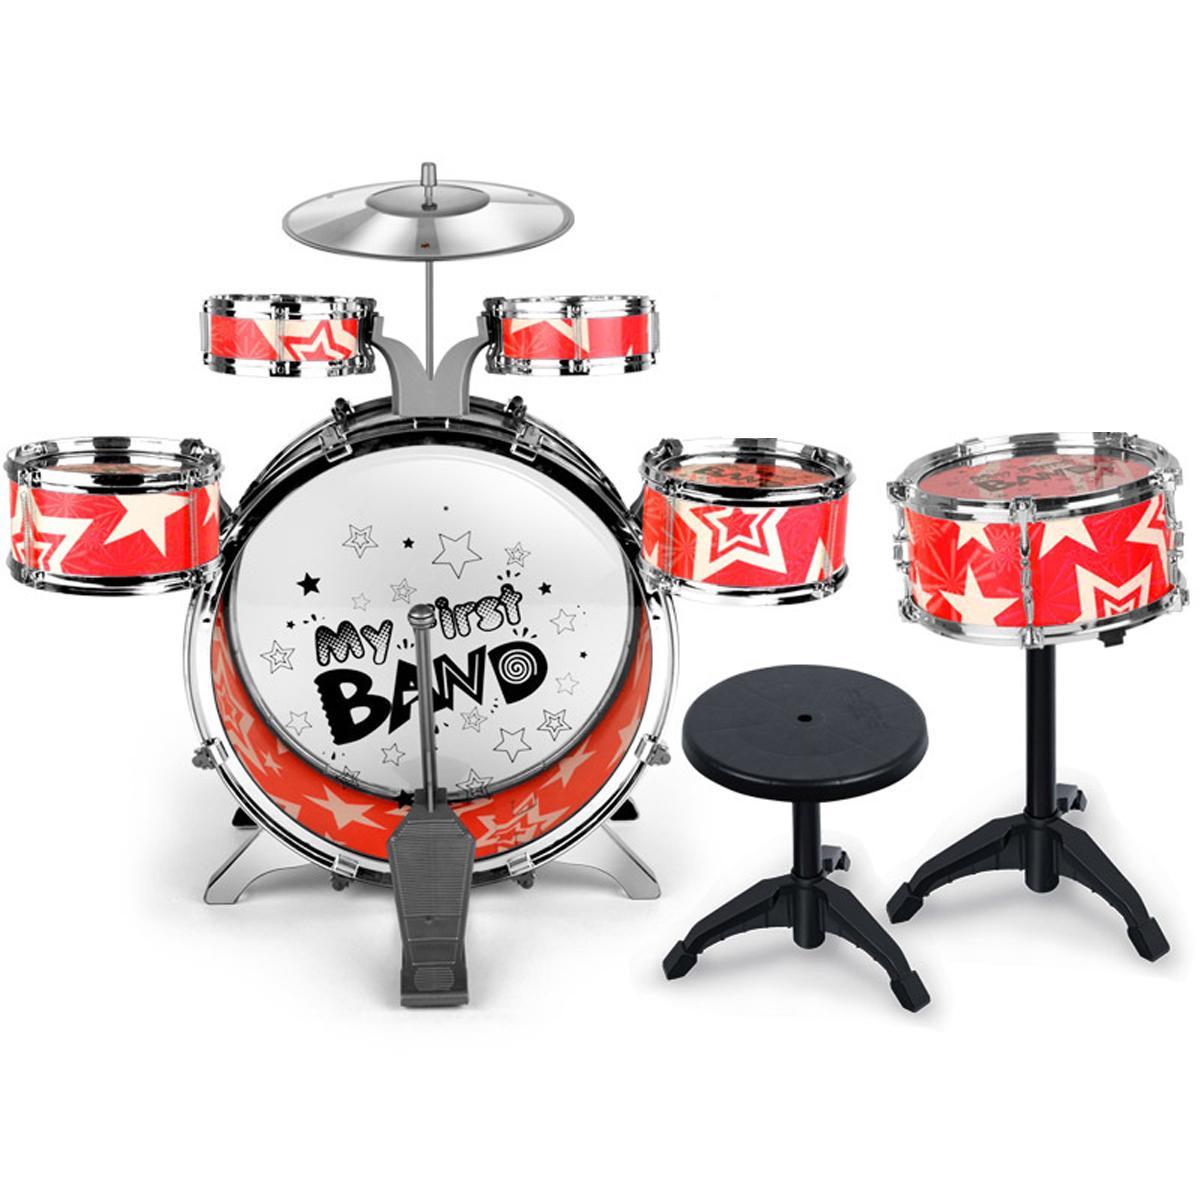 How To Buy Ammoon Compact Travel Box Drum Cajon Flat Hand Drum